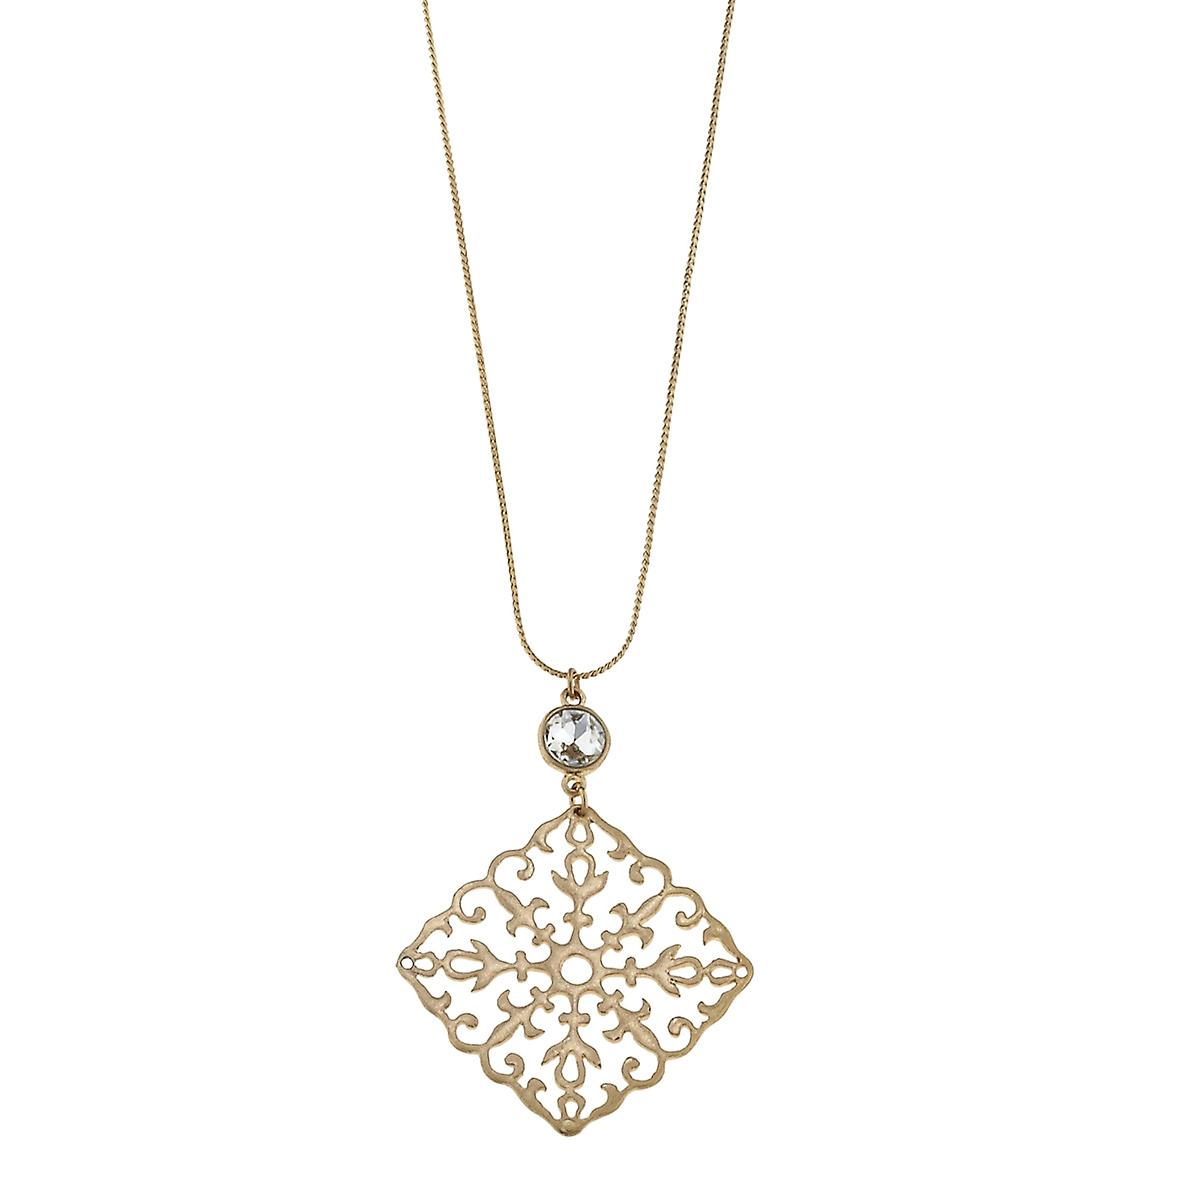 Rhinestone Filigree Slide Chain Necklace